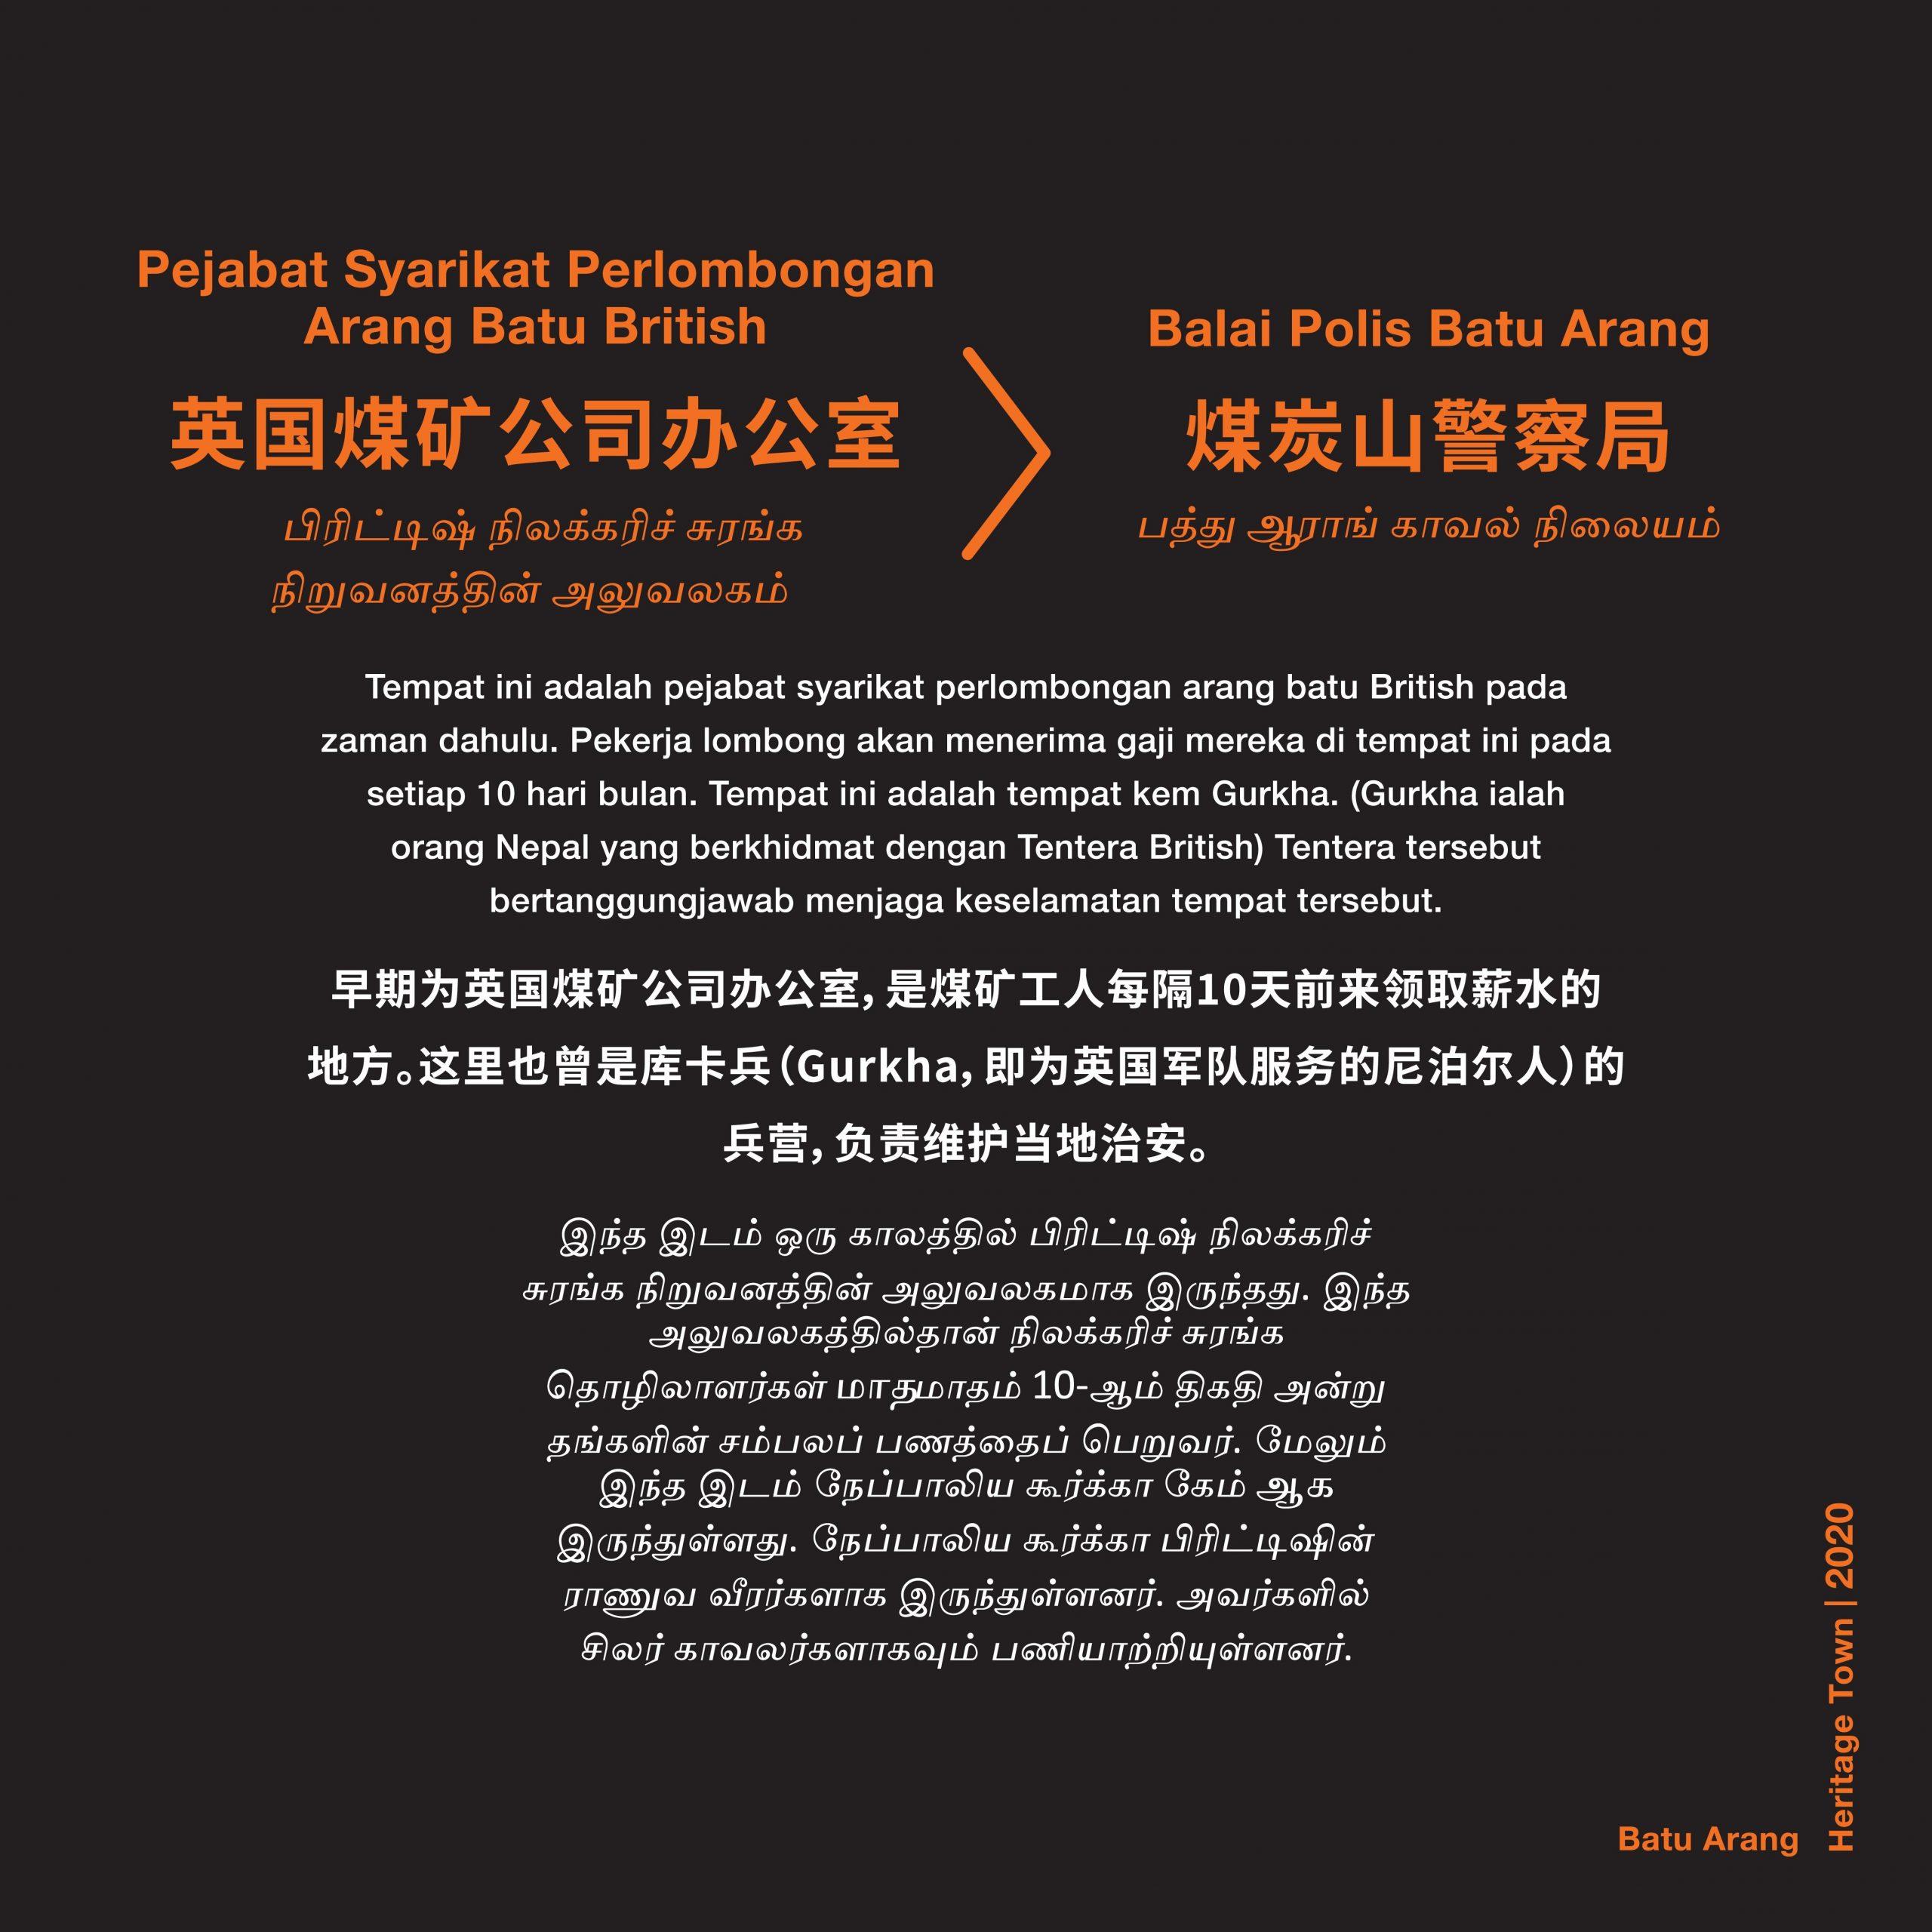 BatuArang-BuildingIntroduction-FAOL-04_00008